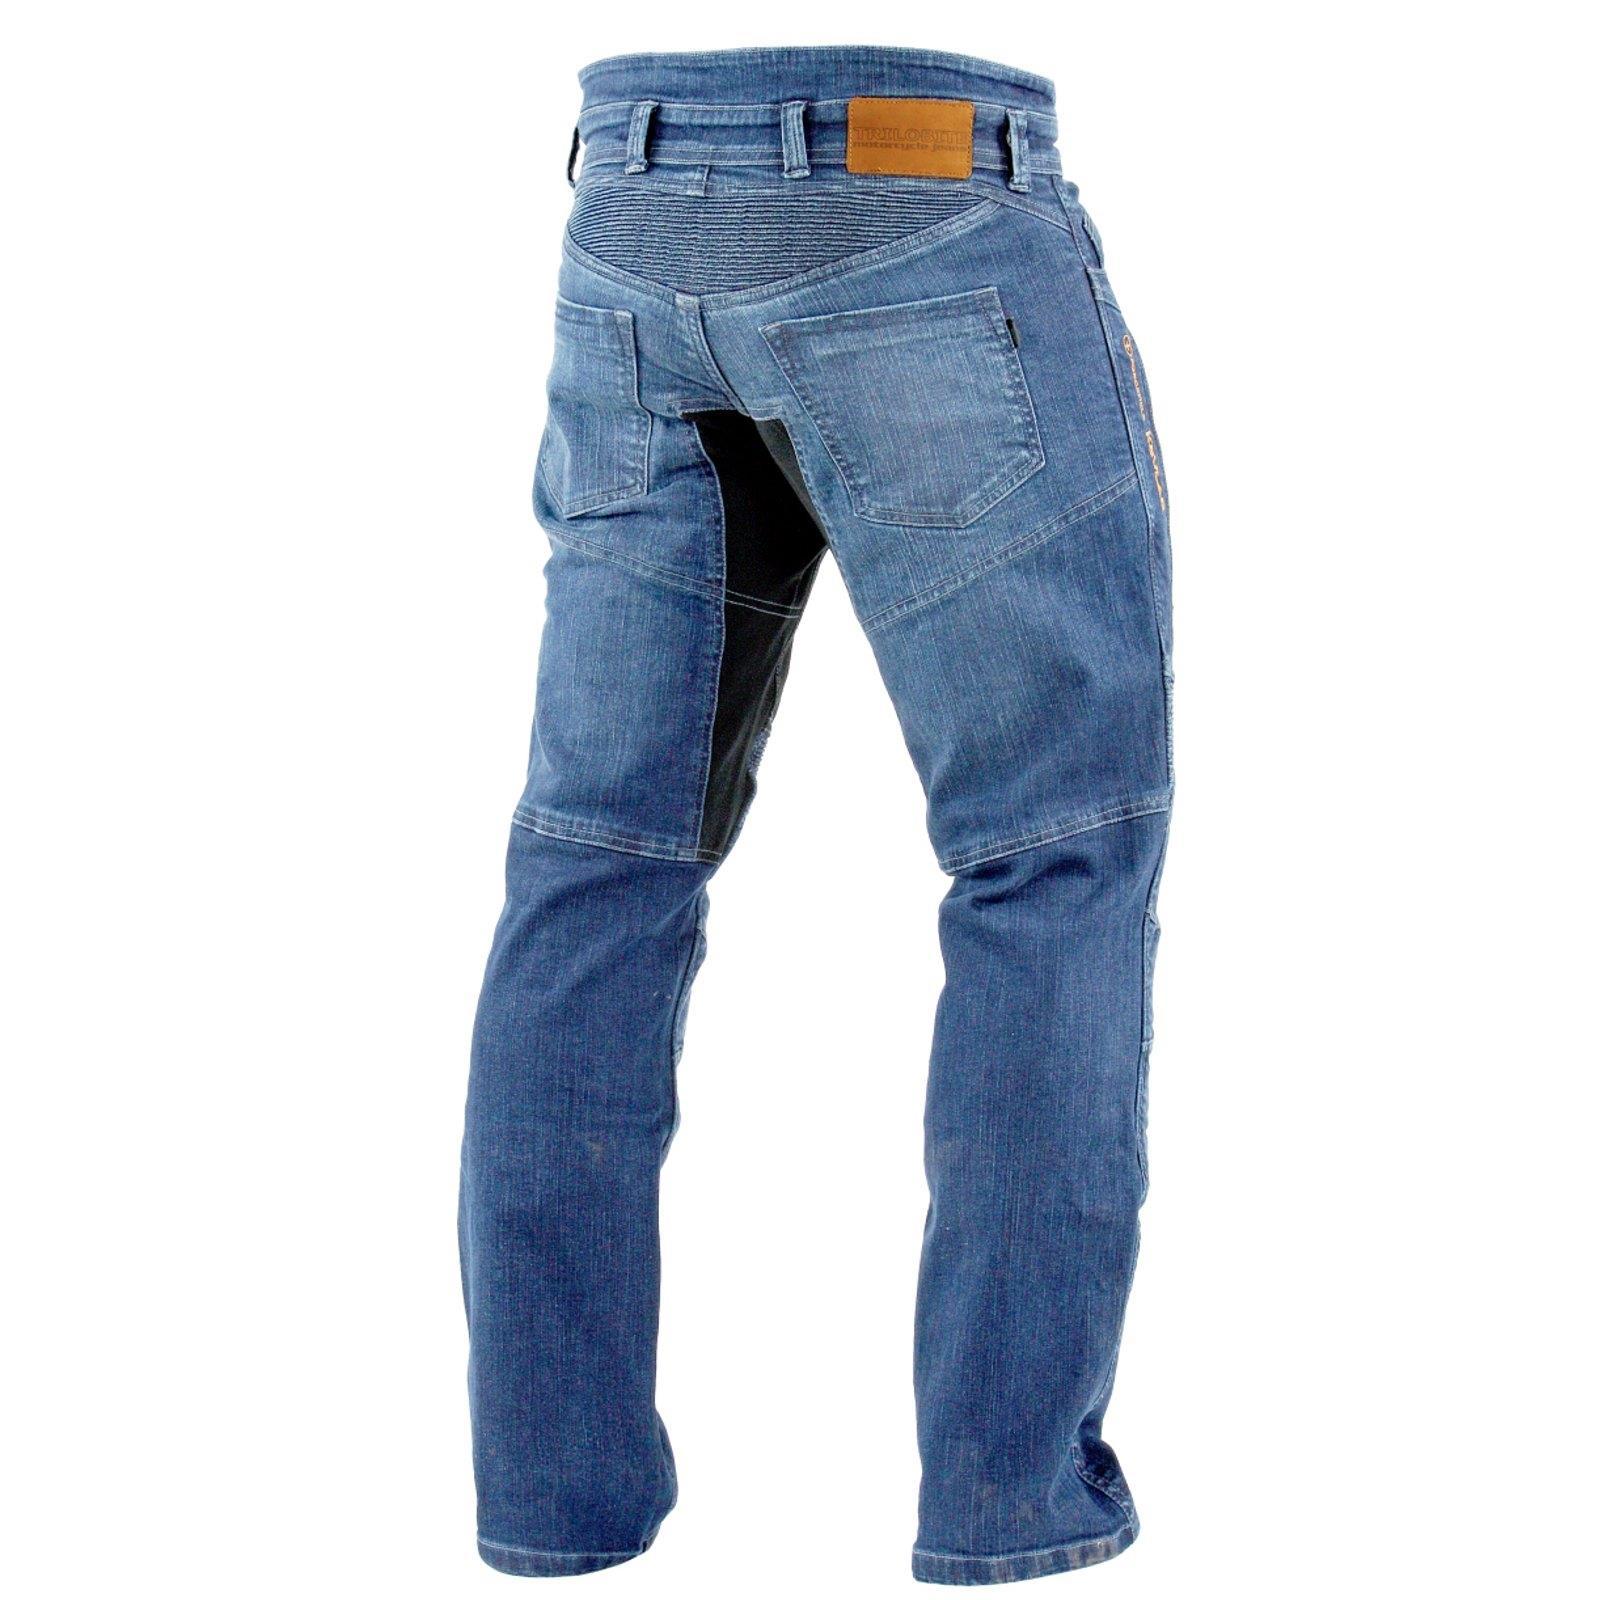 Trilobite-Pantaloni-Moto-Jeans-Abbigliamento-Parado-MICAS-URBAN-DUAL-PANTS-ACID miniatura 41